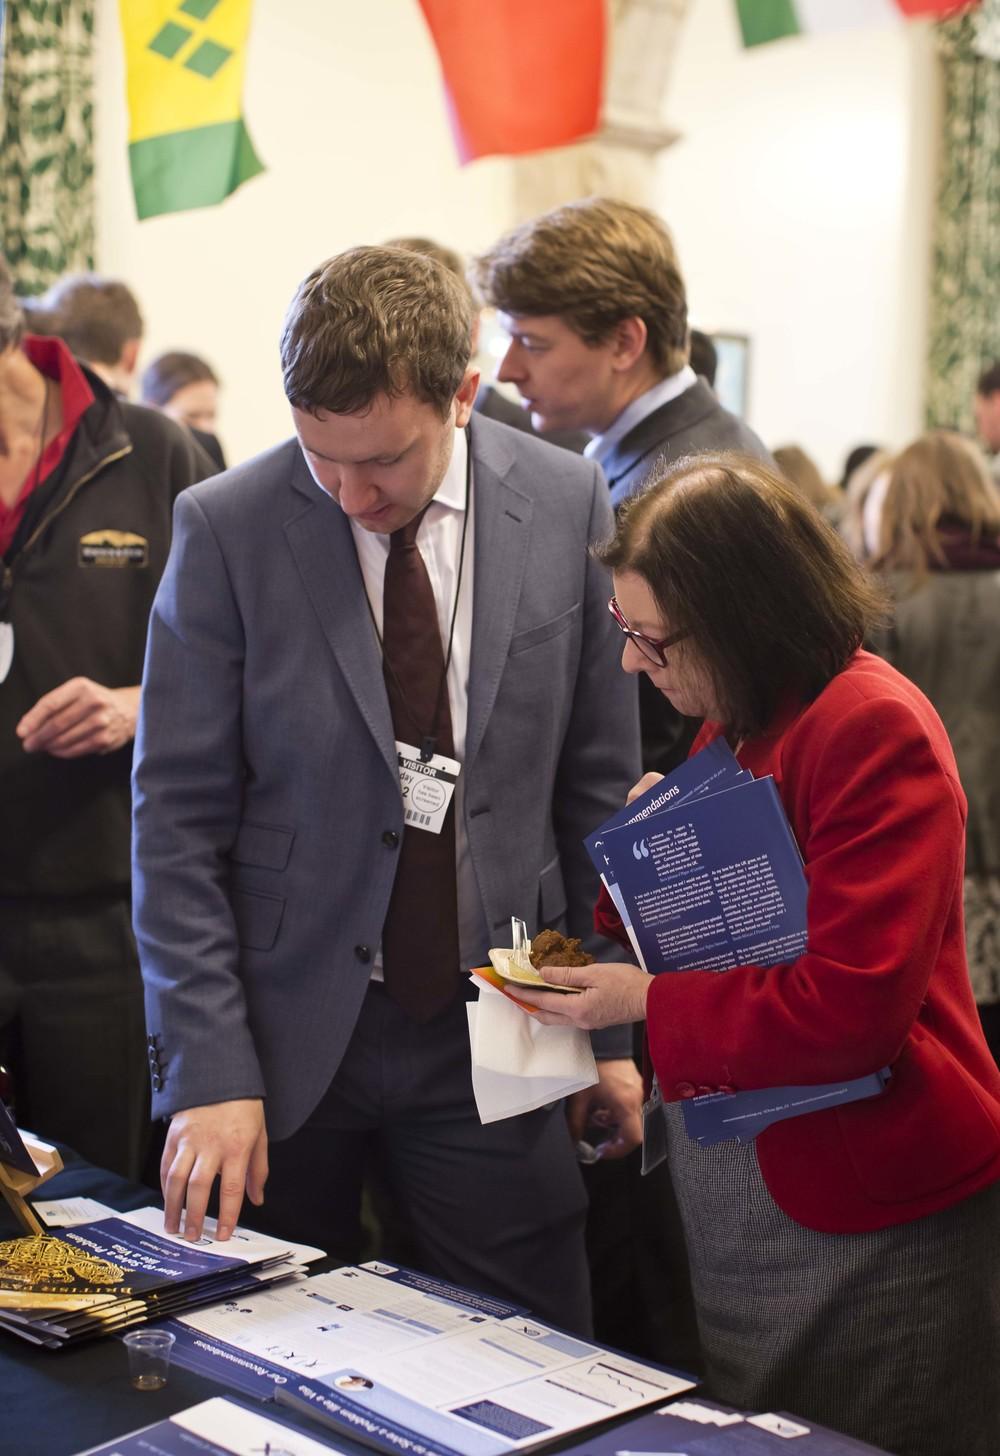 Commonwealth food event 2014-2603.jpg